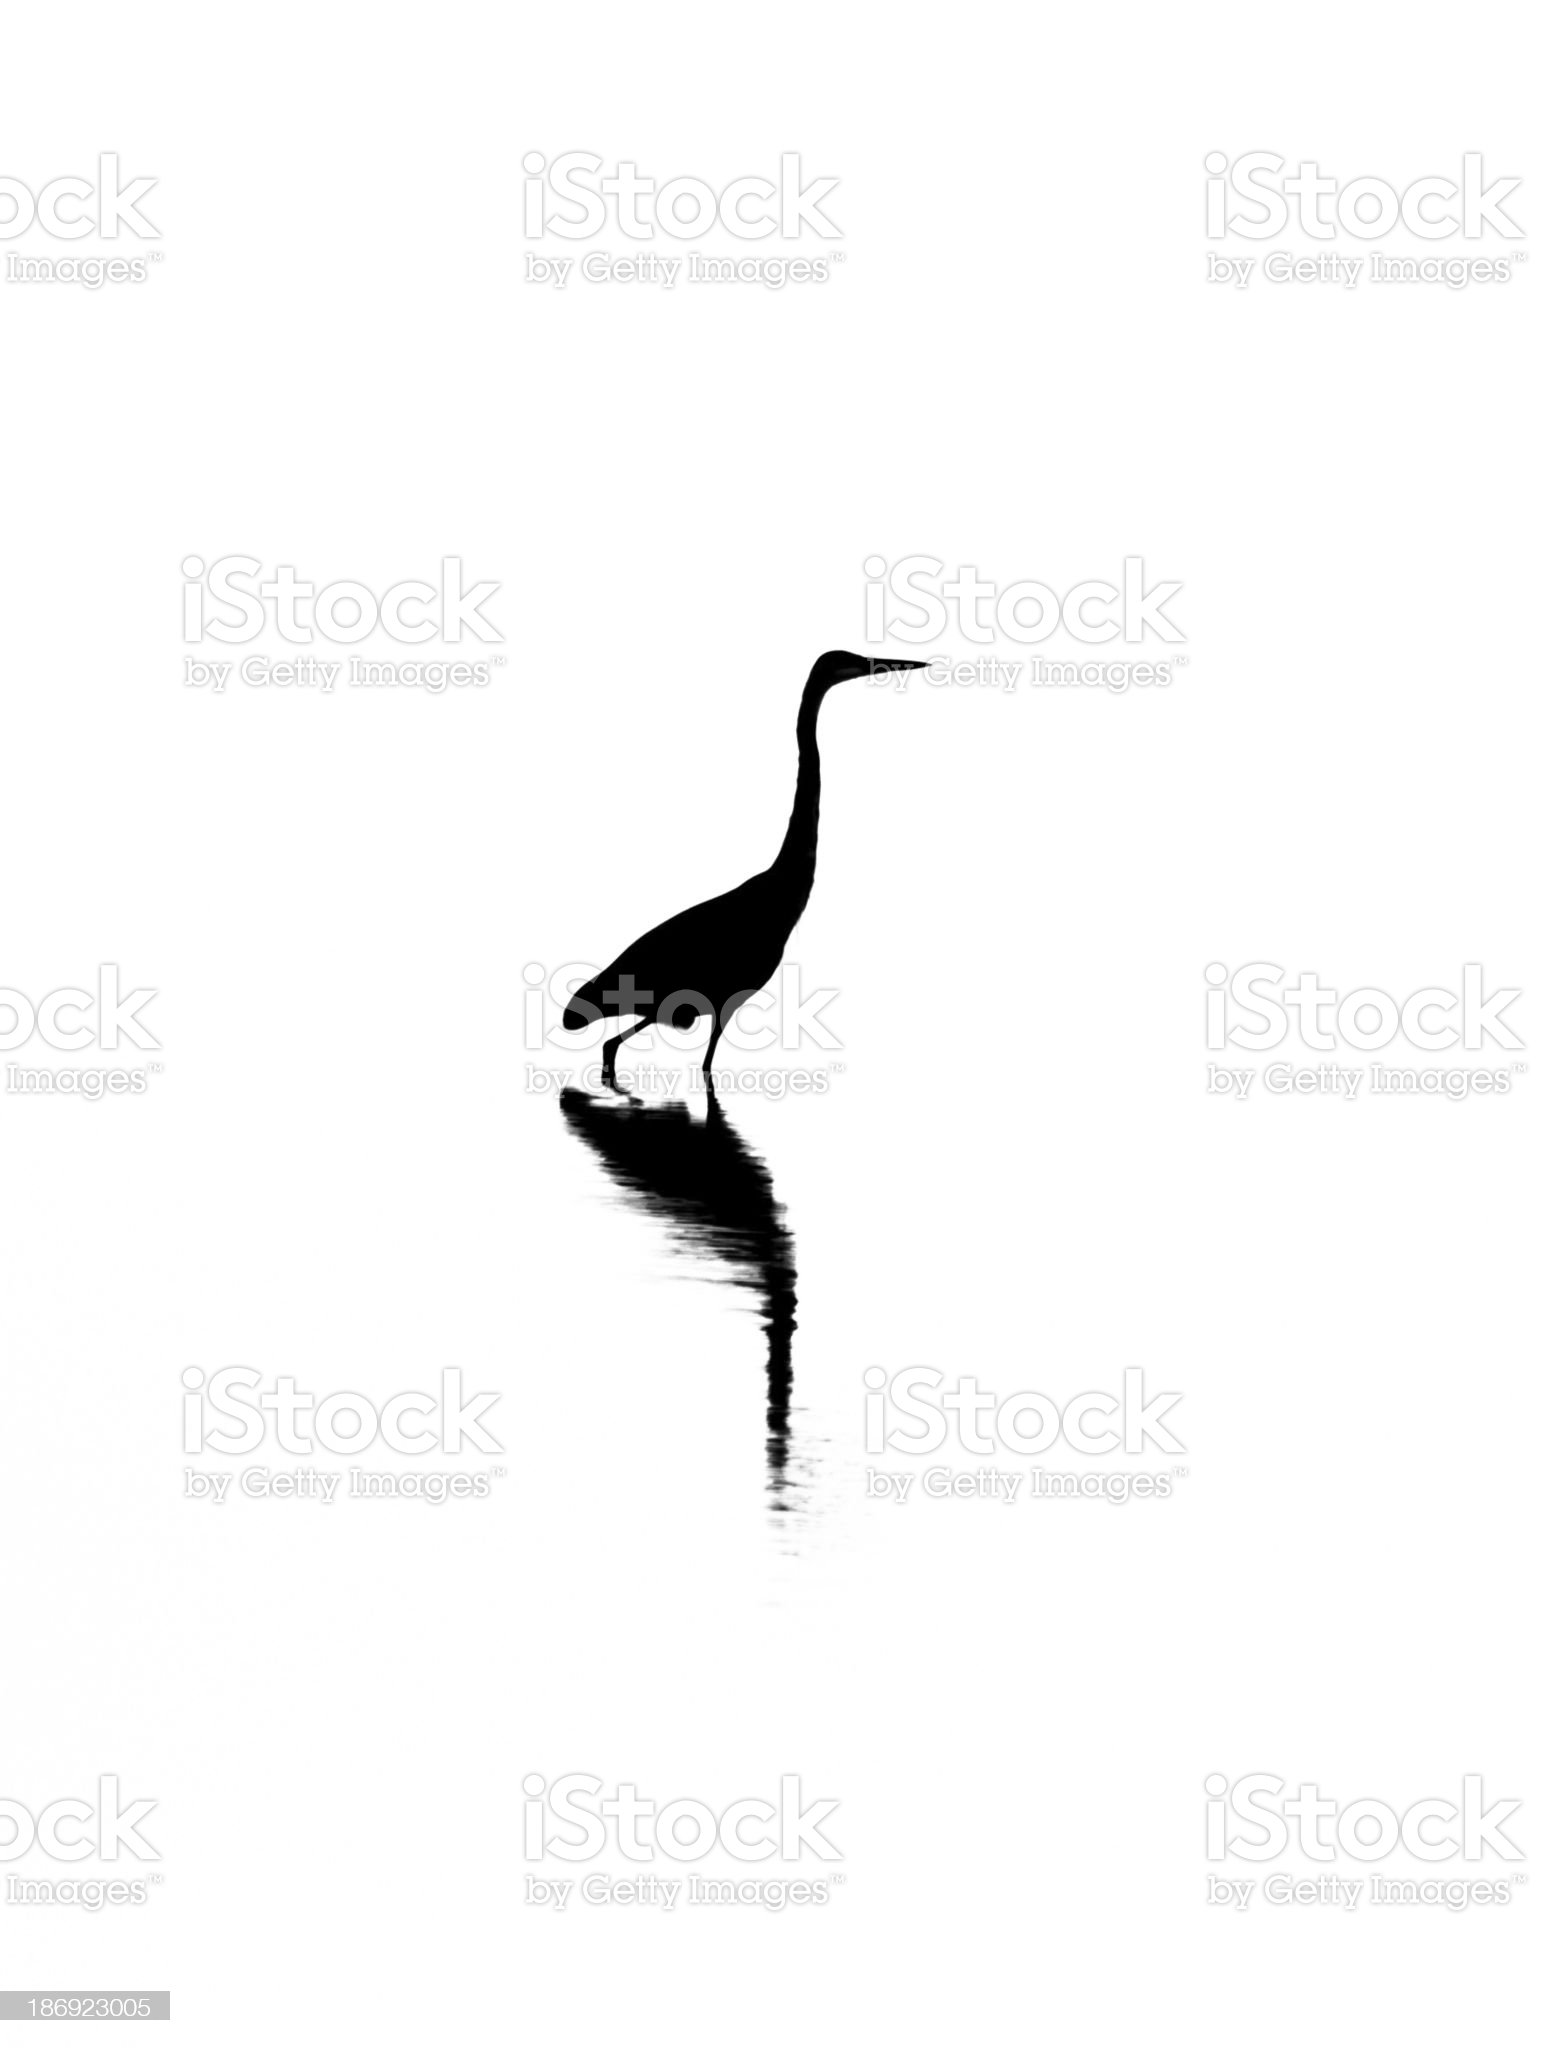 Great Blue Heron Bird royalty-free stock photo